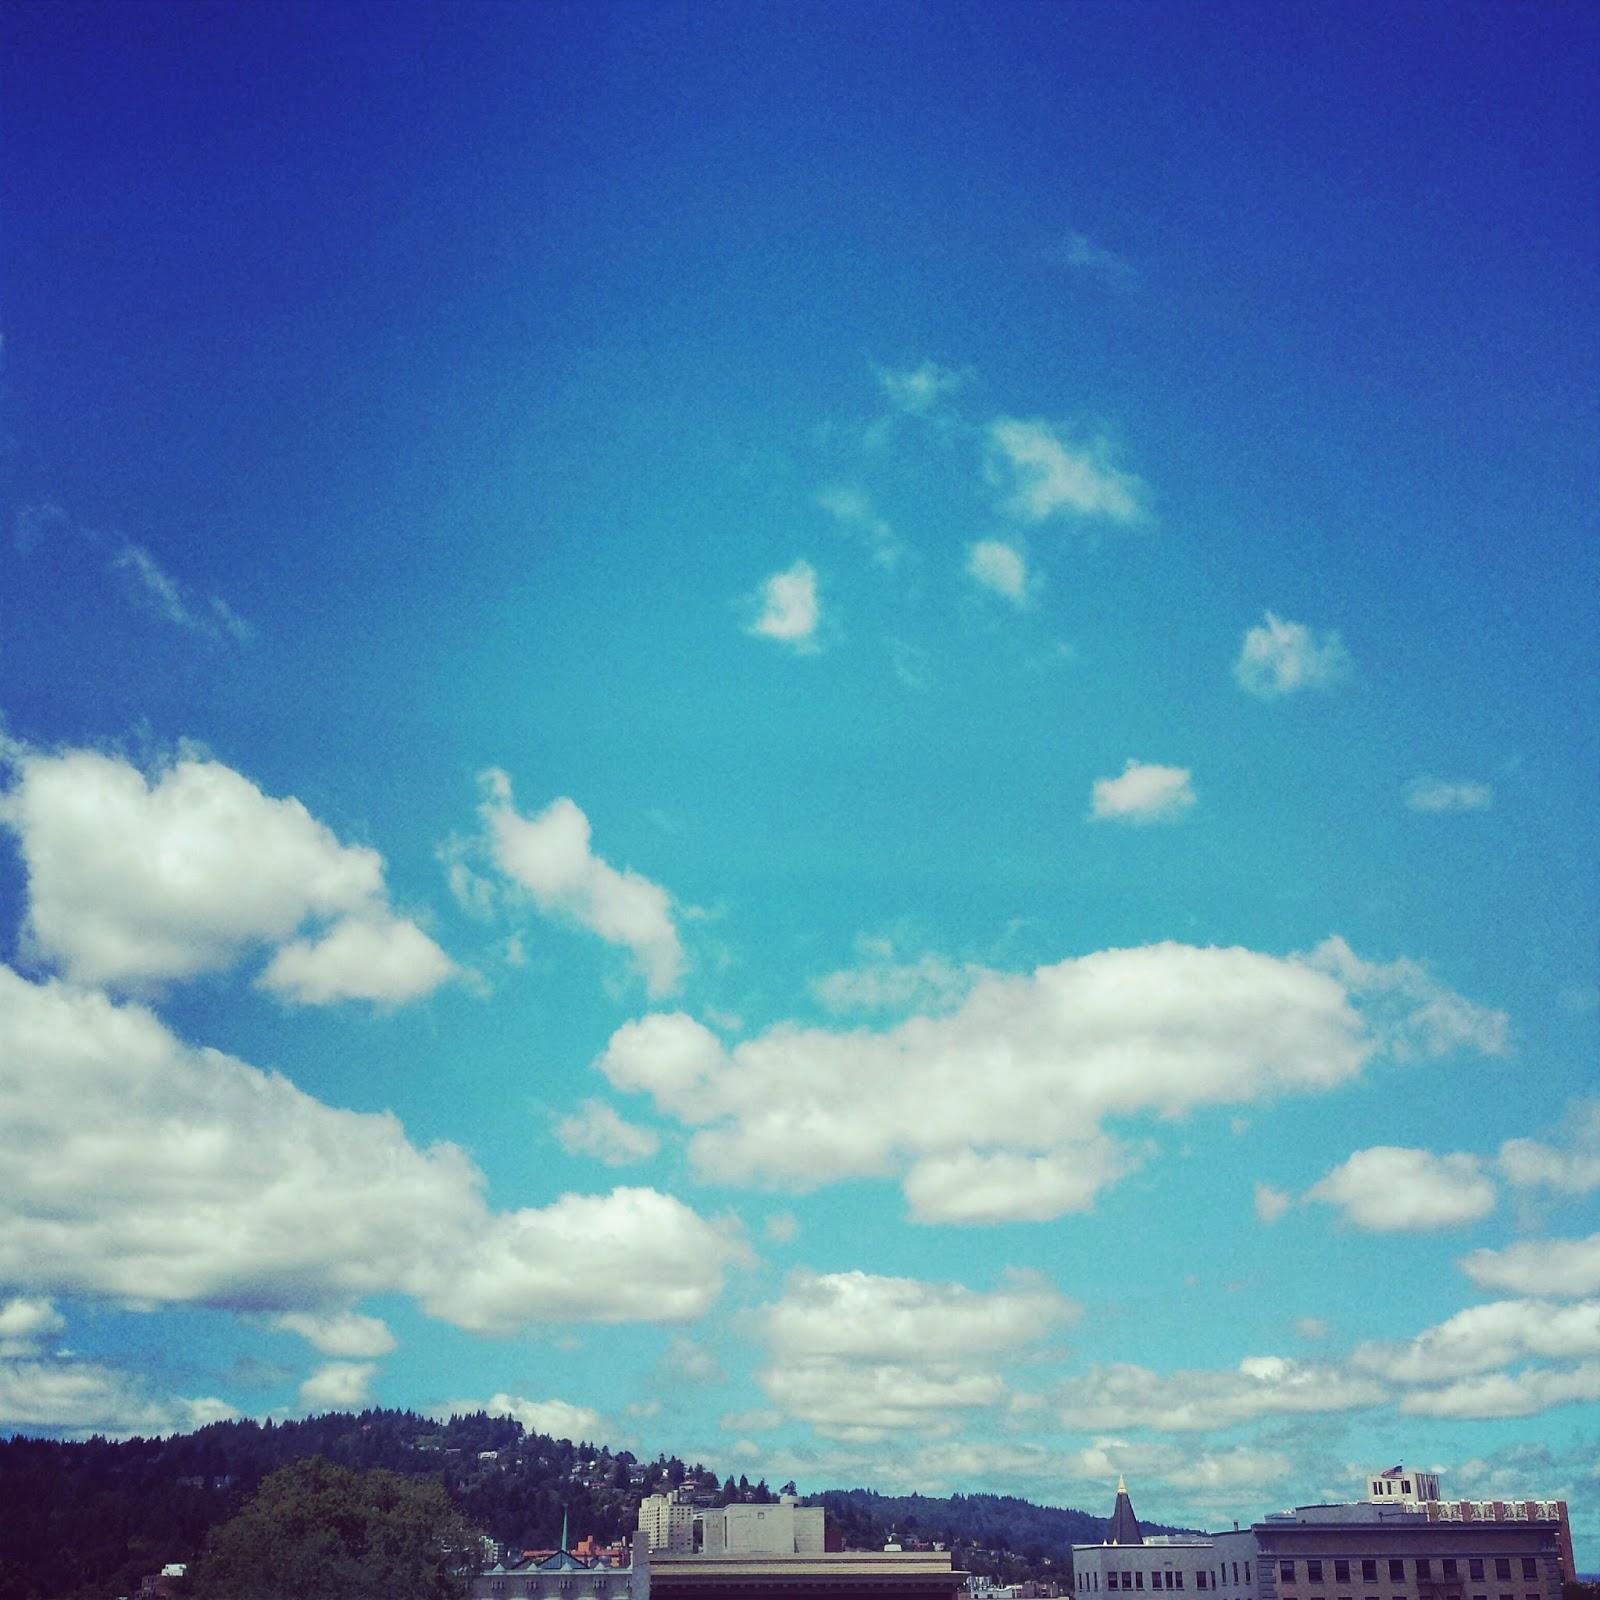 Road trip travel tips blog